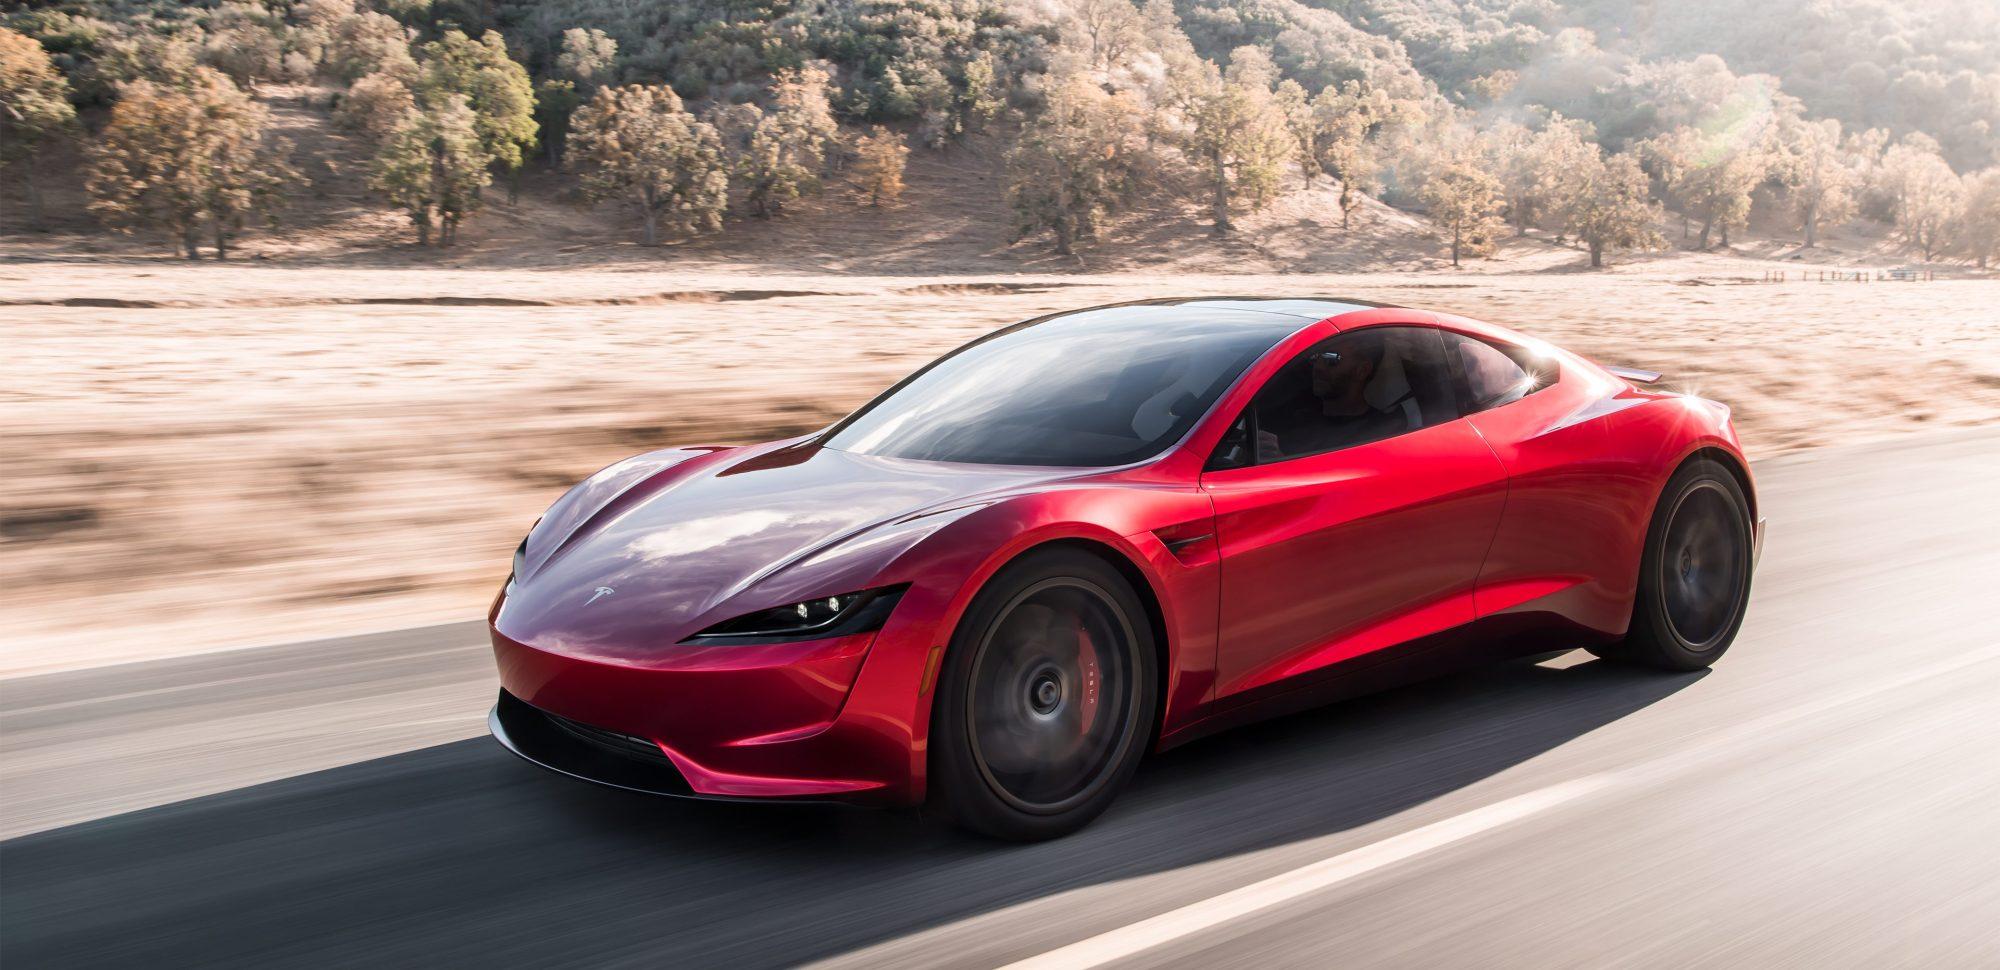 Xe Tesla Roadster thế hệ 2 4